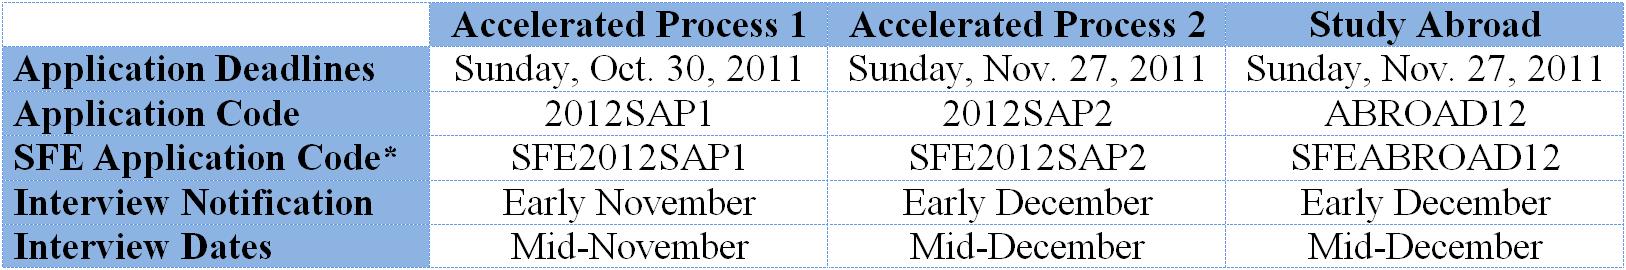 Goldman Sachs 2012 Summer Internship Accelerated Process